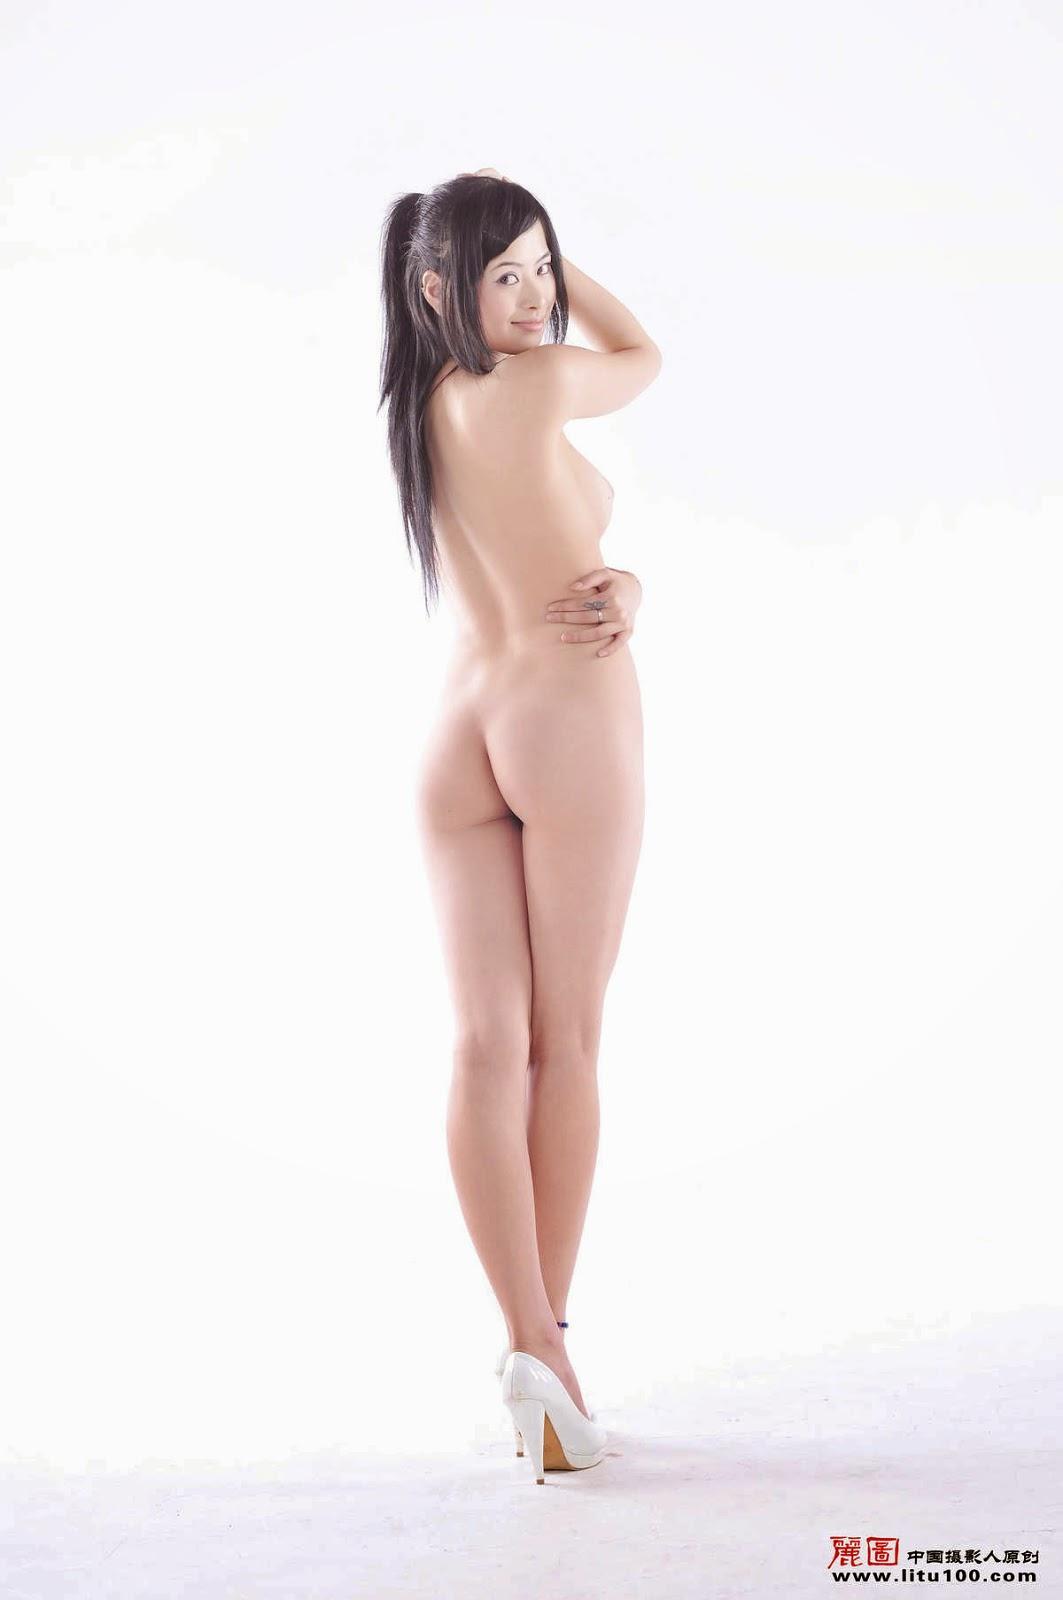 PhimVu Blog: Chinese Nude Model Zuer [Litu100]   PhimVu Blog photos